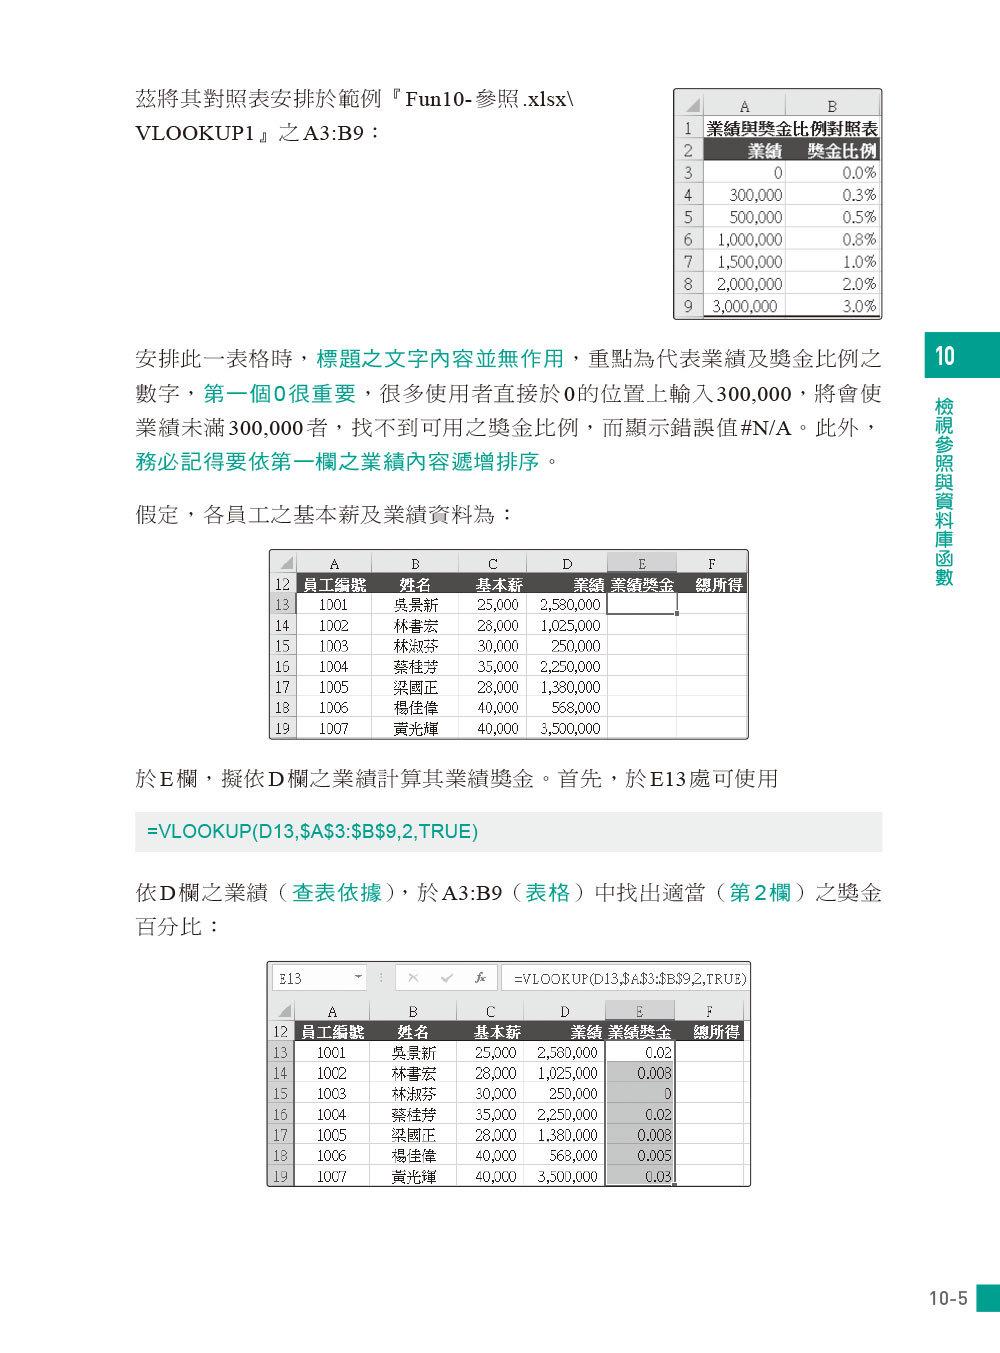 Excel 函數與分析工具 -- 應用解析x實務範例x統計分析 (適用Excel 2019~2013)-preview-5